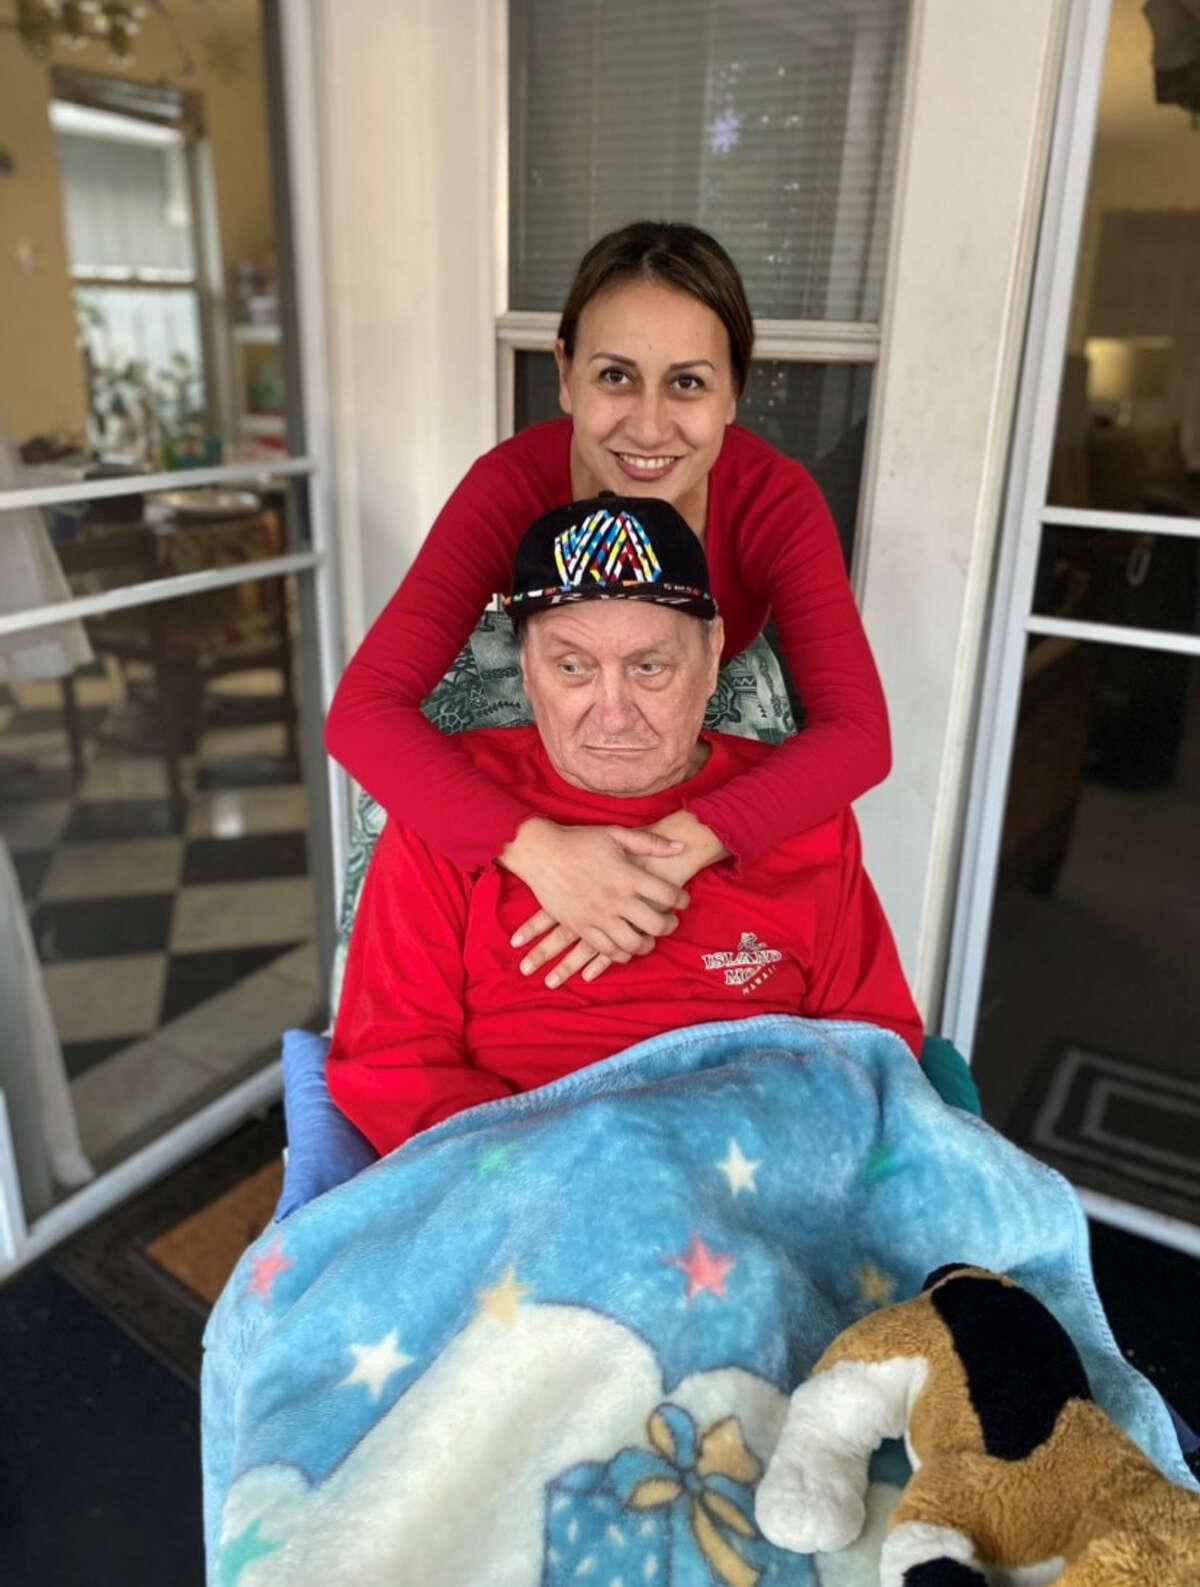 Poki'i Balaz with her father, John Balaz, in their home in Aiea, Hawaii.